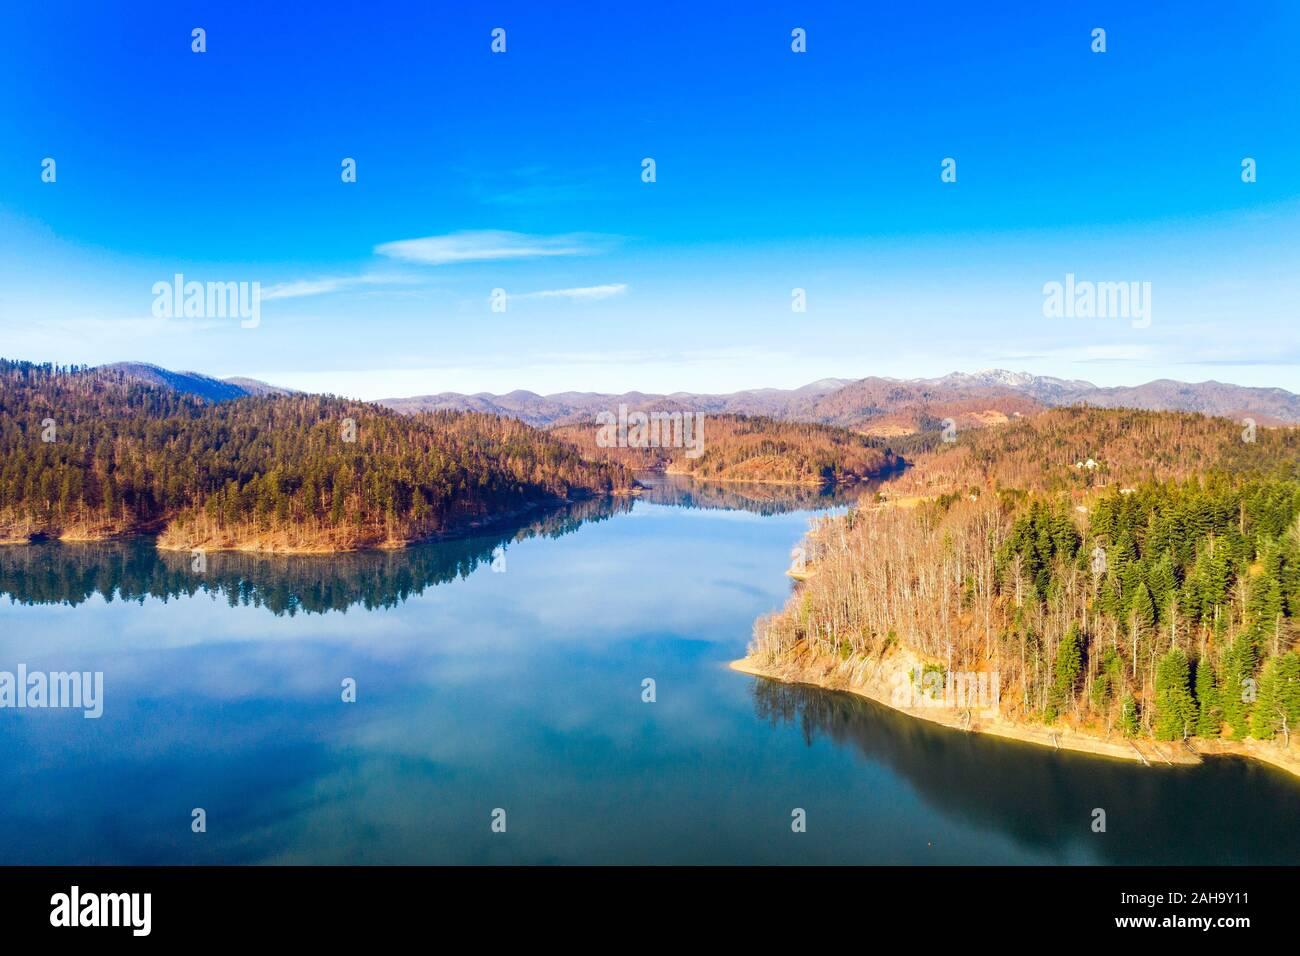 Croatia, Risnjak mountain and Lokvarsko lake in Gorski kotar, autumn colors, panoramic view Stock Photo